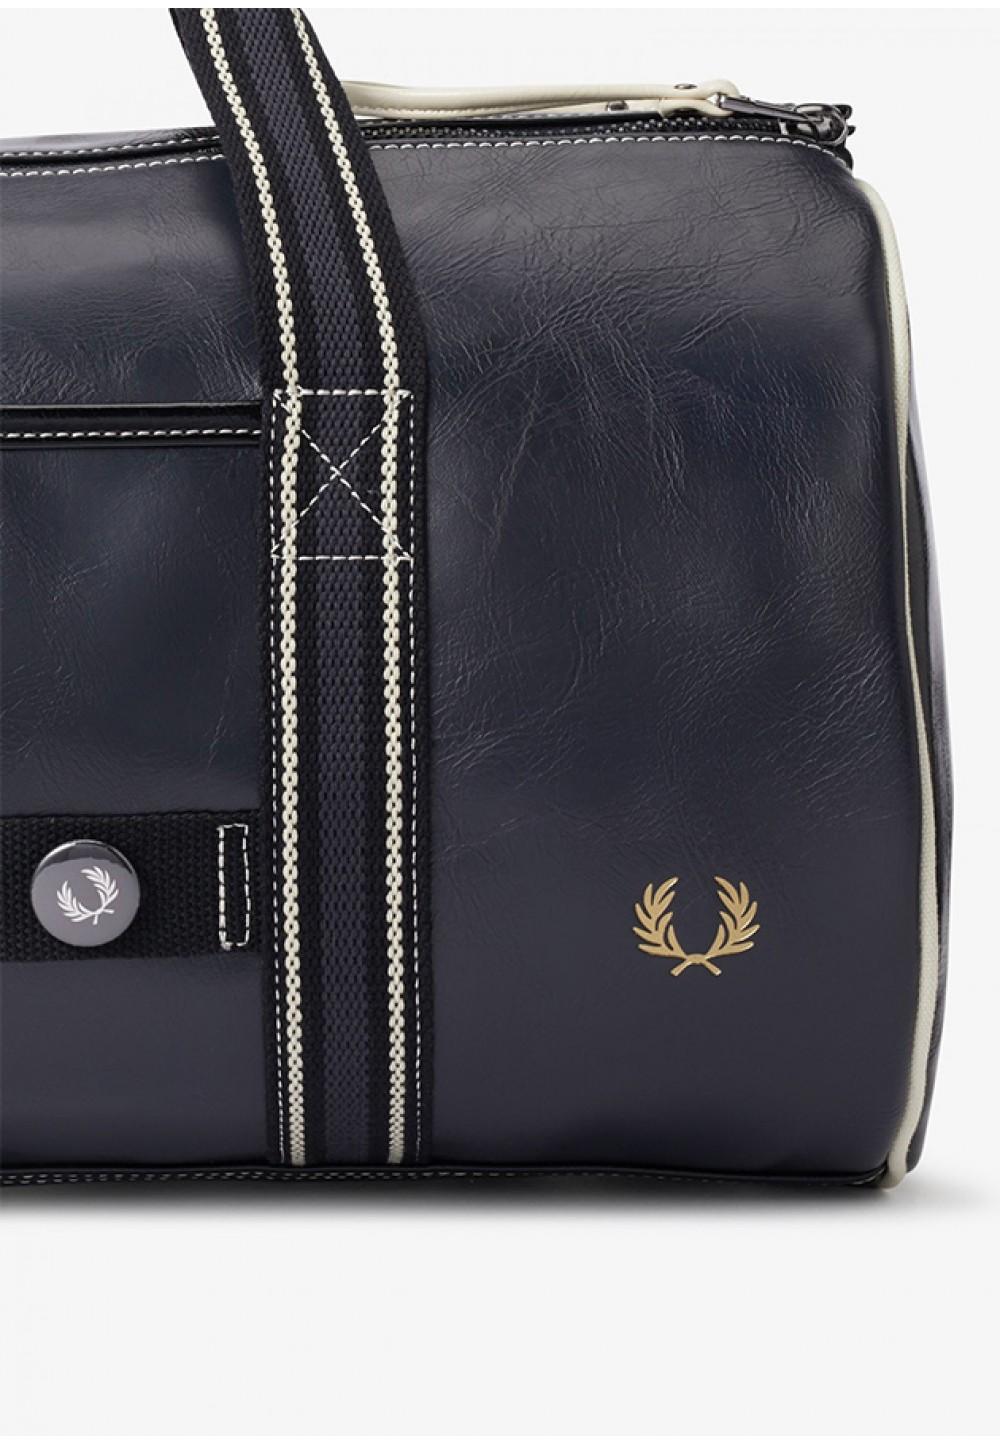 Сумка-бочонок чорного кольору з логотипом